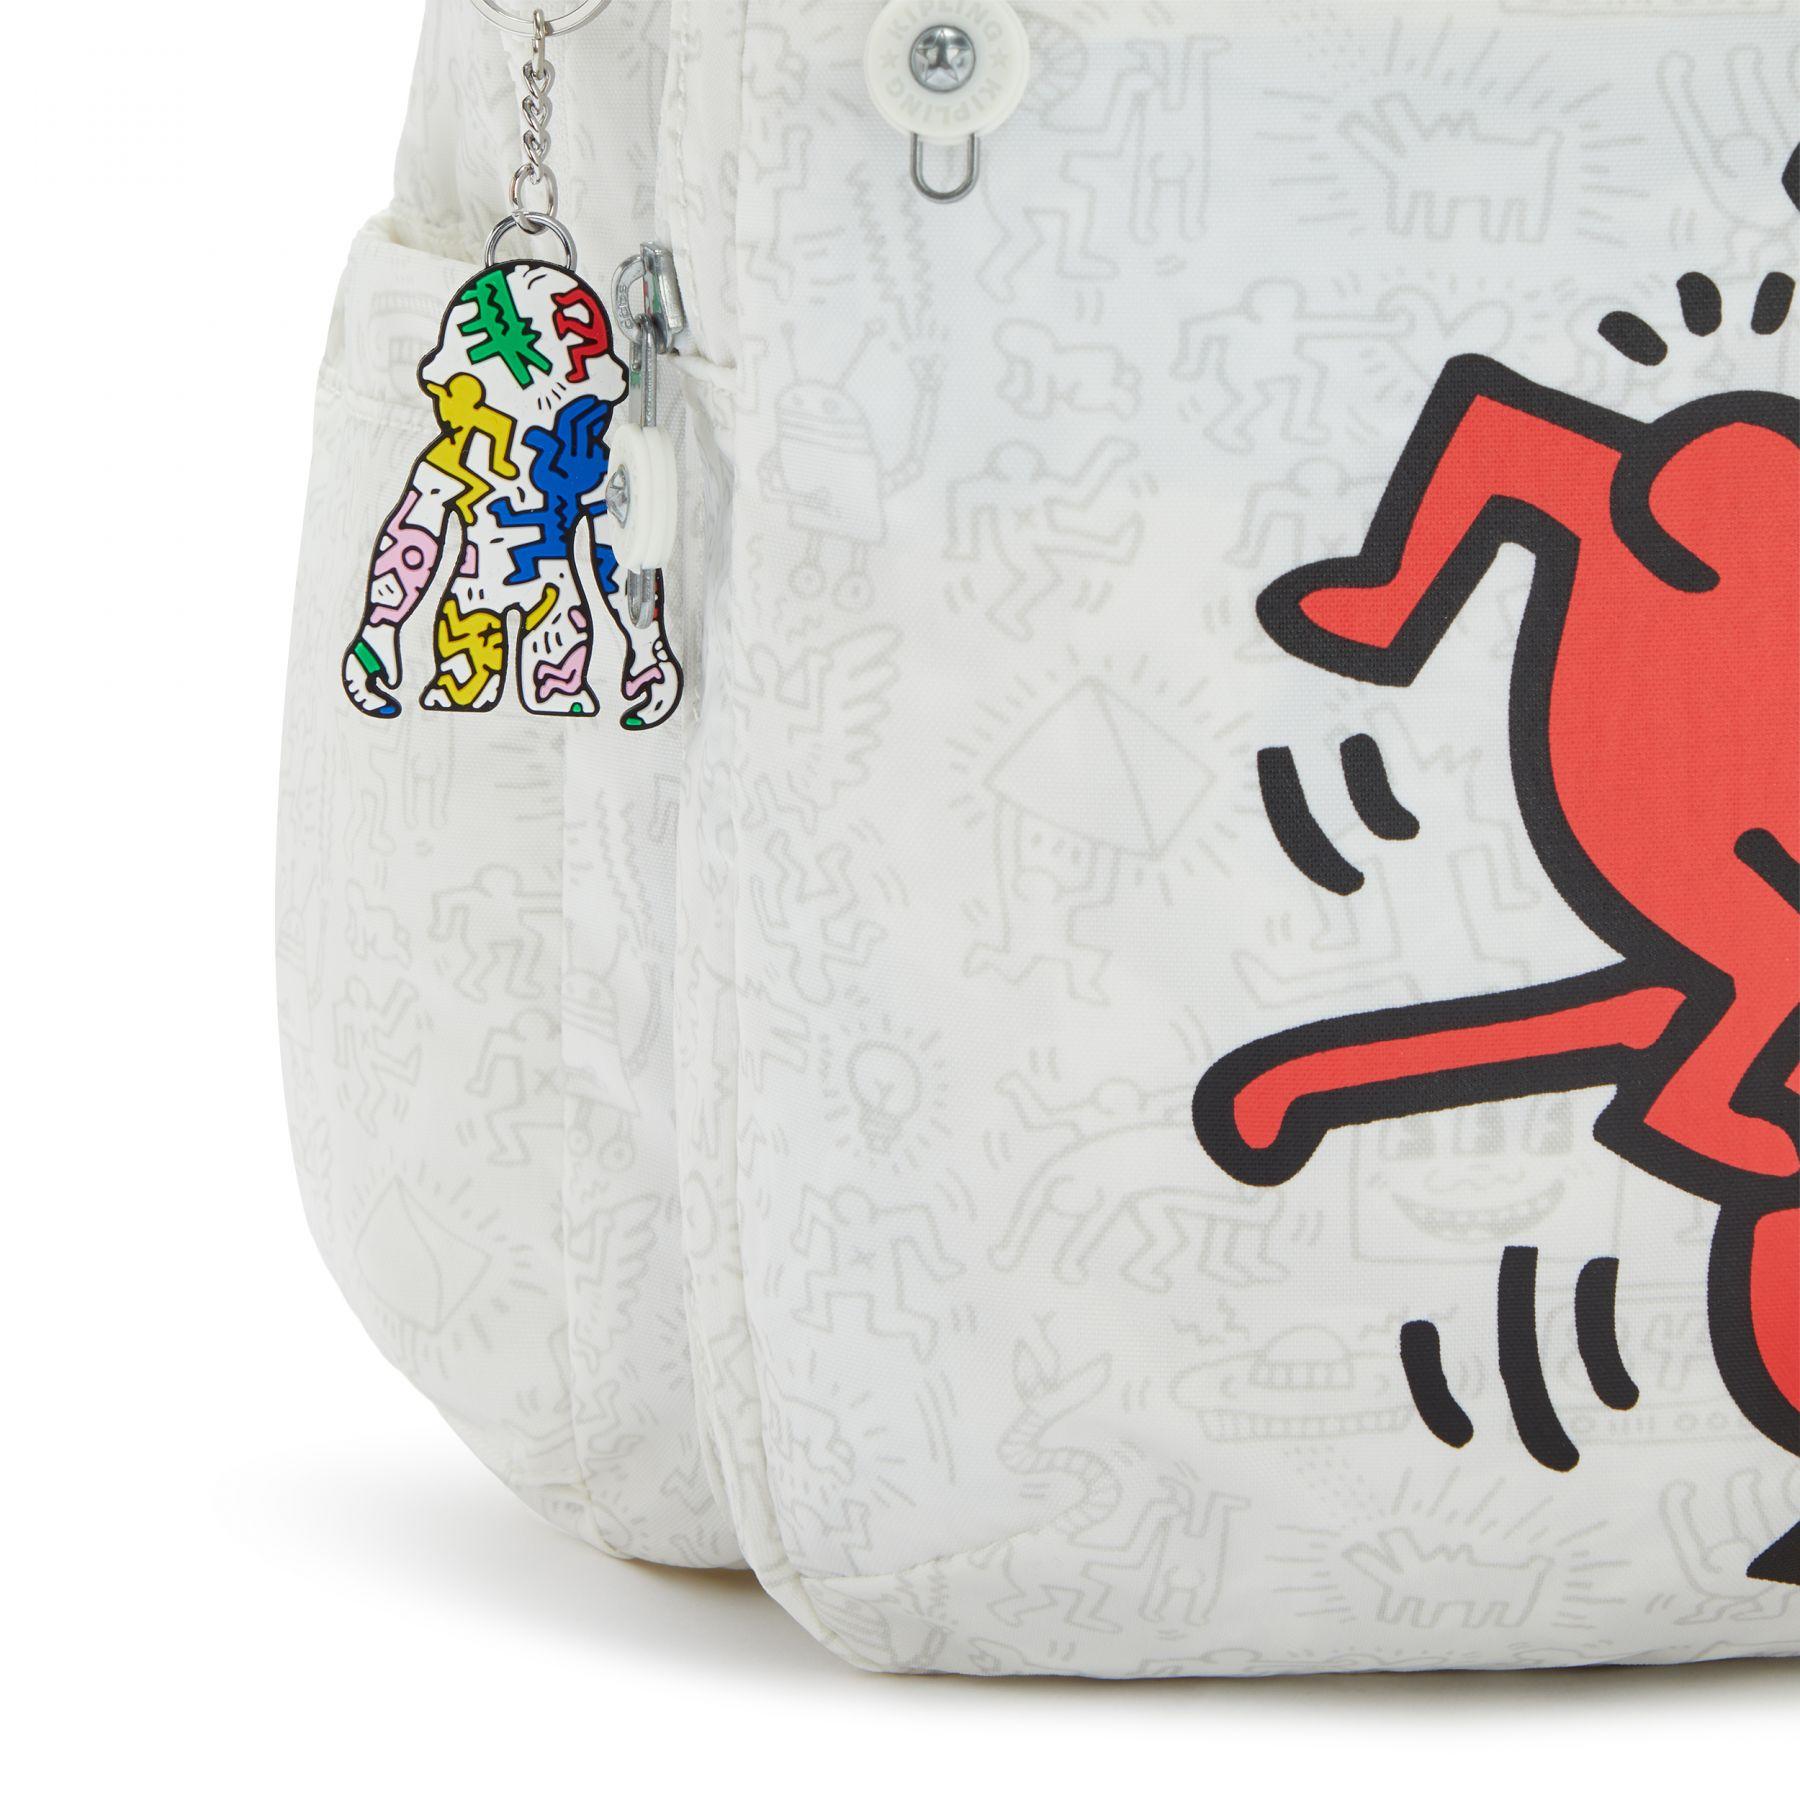 Zaino Keith Haring Kiplin Kipling   Zaini   SEOULHARING